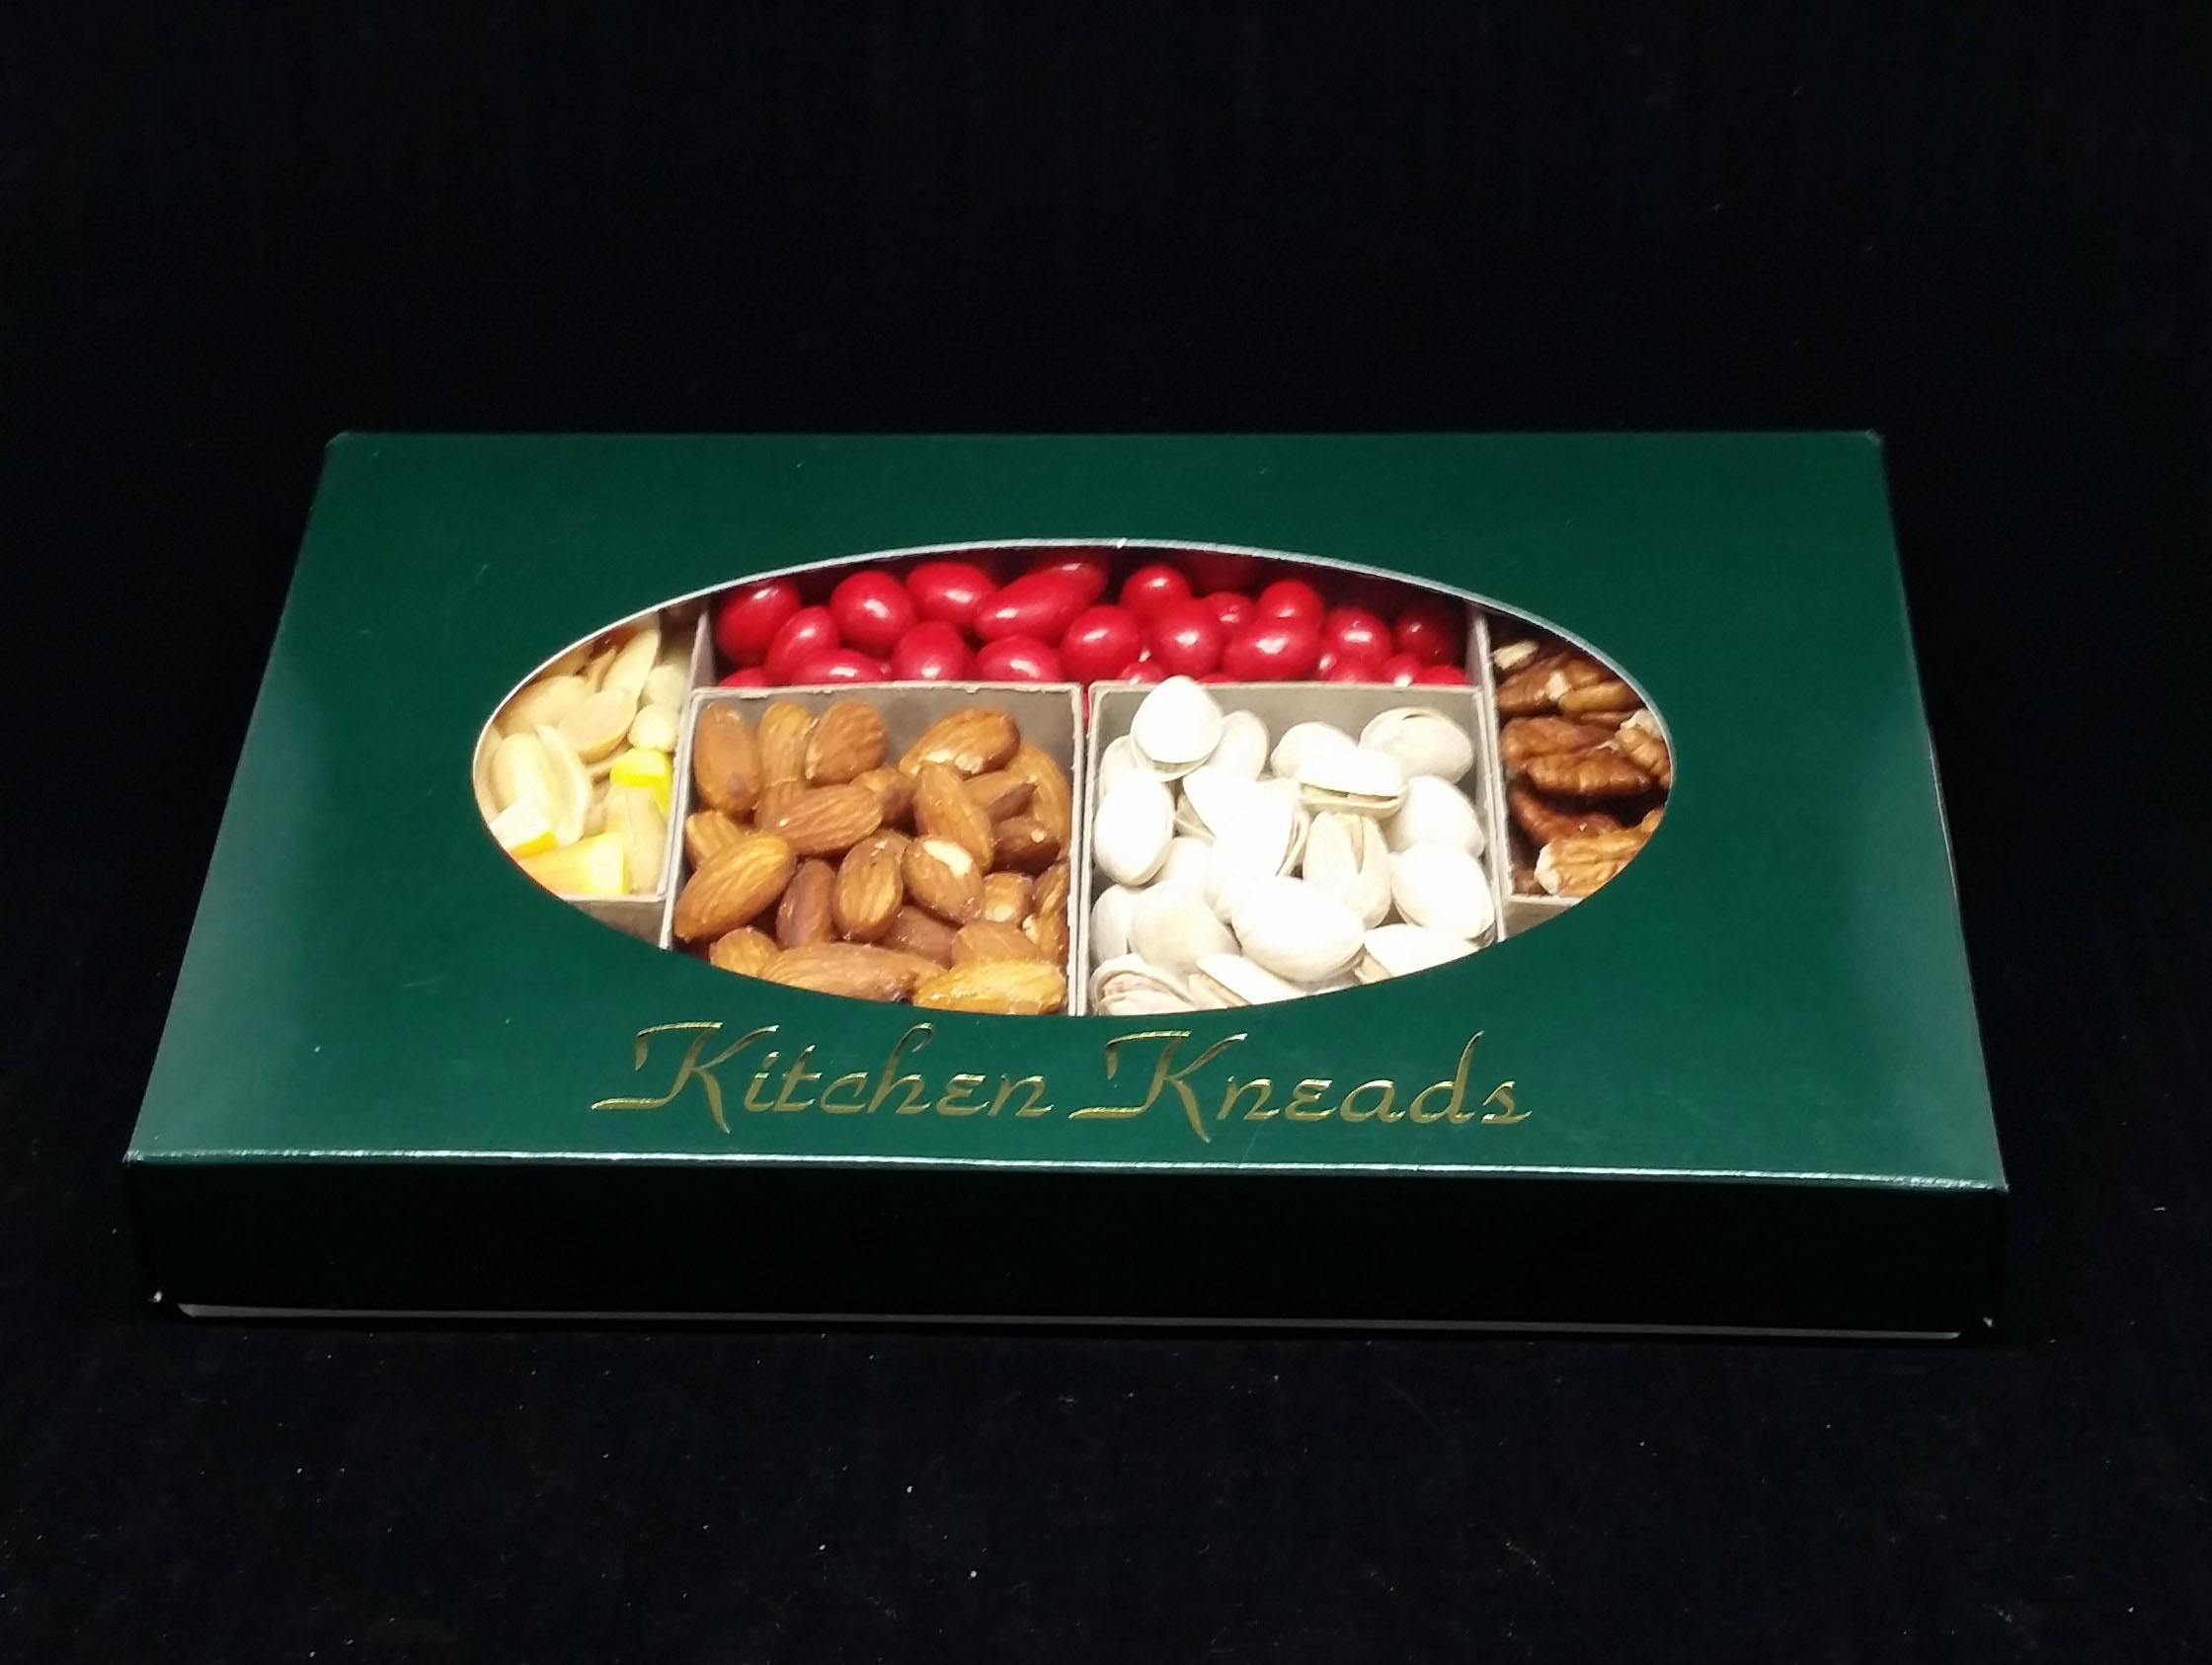 Forest Green 1 lb Box  Gift Boxes  Kitchen Kneads  Ogden Utah